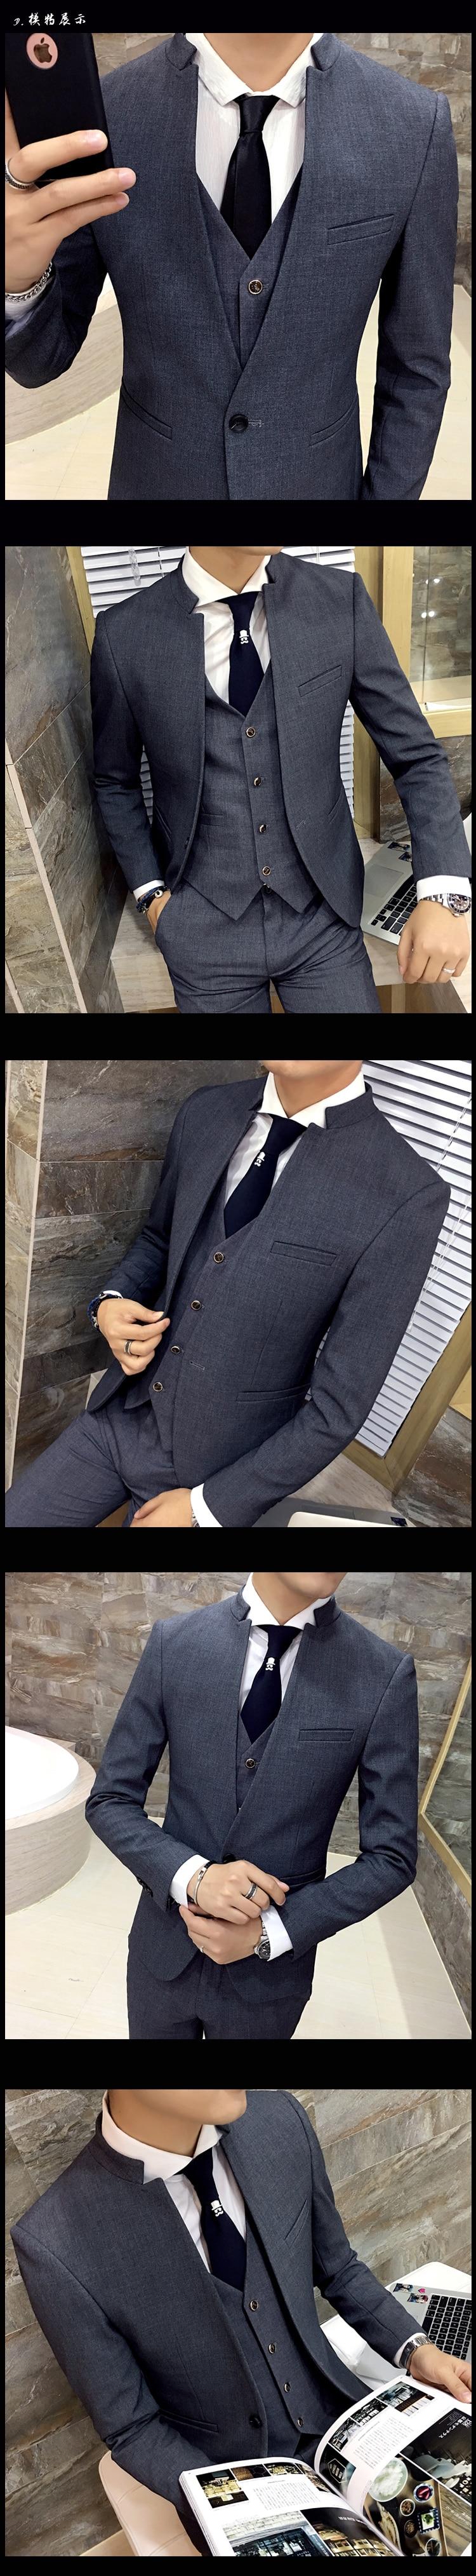 HTB1SKb0SFXXXXXrXFXXq6xXFXXX8 - 2017 new Korean wedding dress stand collar suit jacket men's self-cultivation business casual good quality suits male jacket